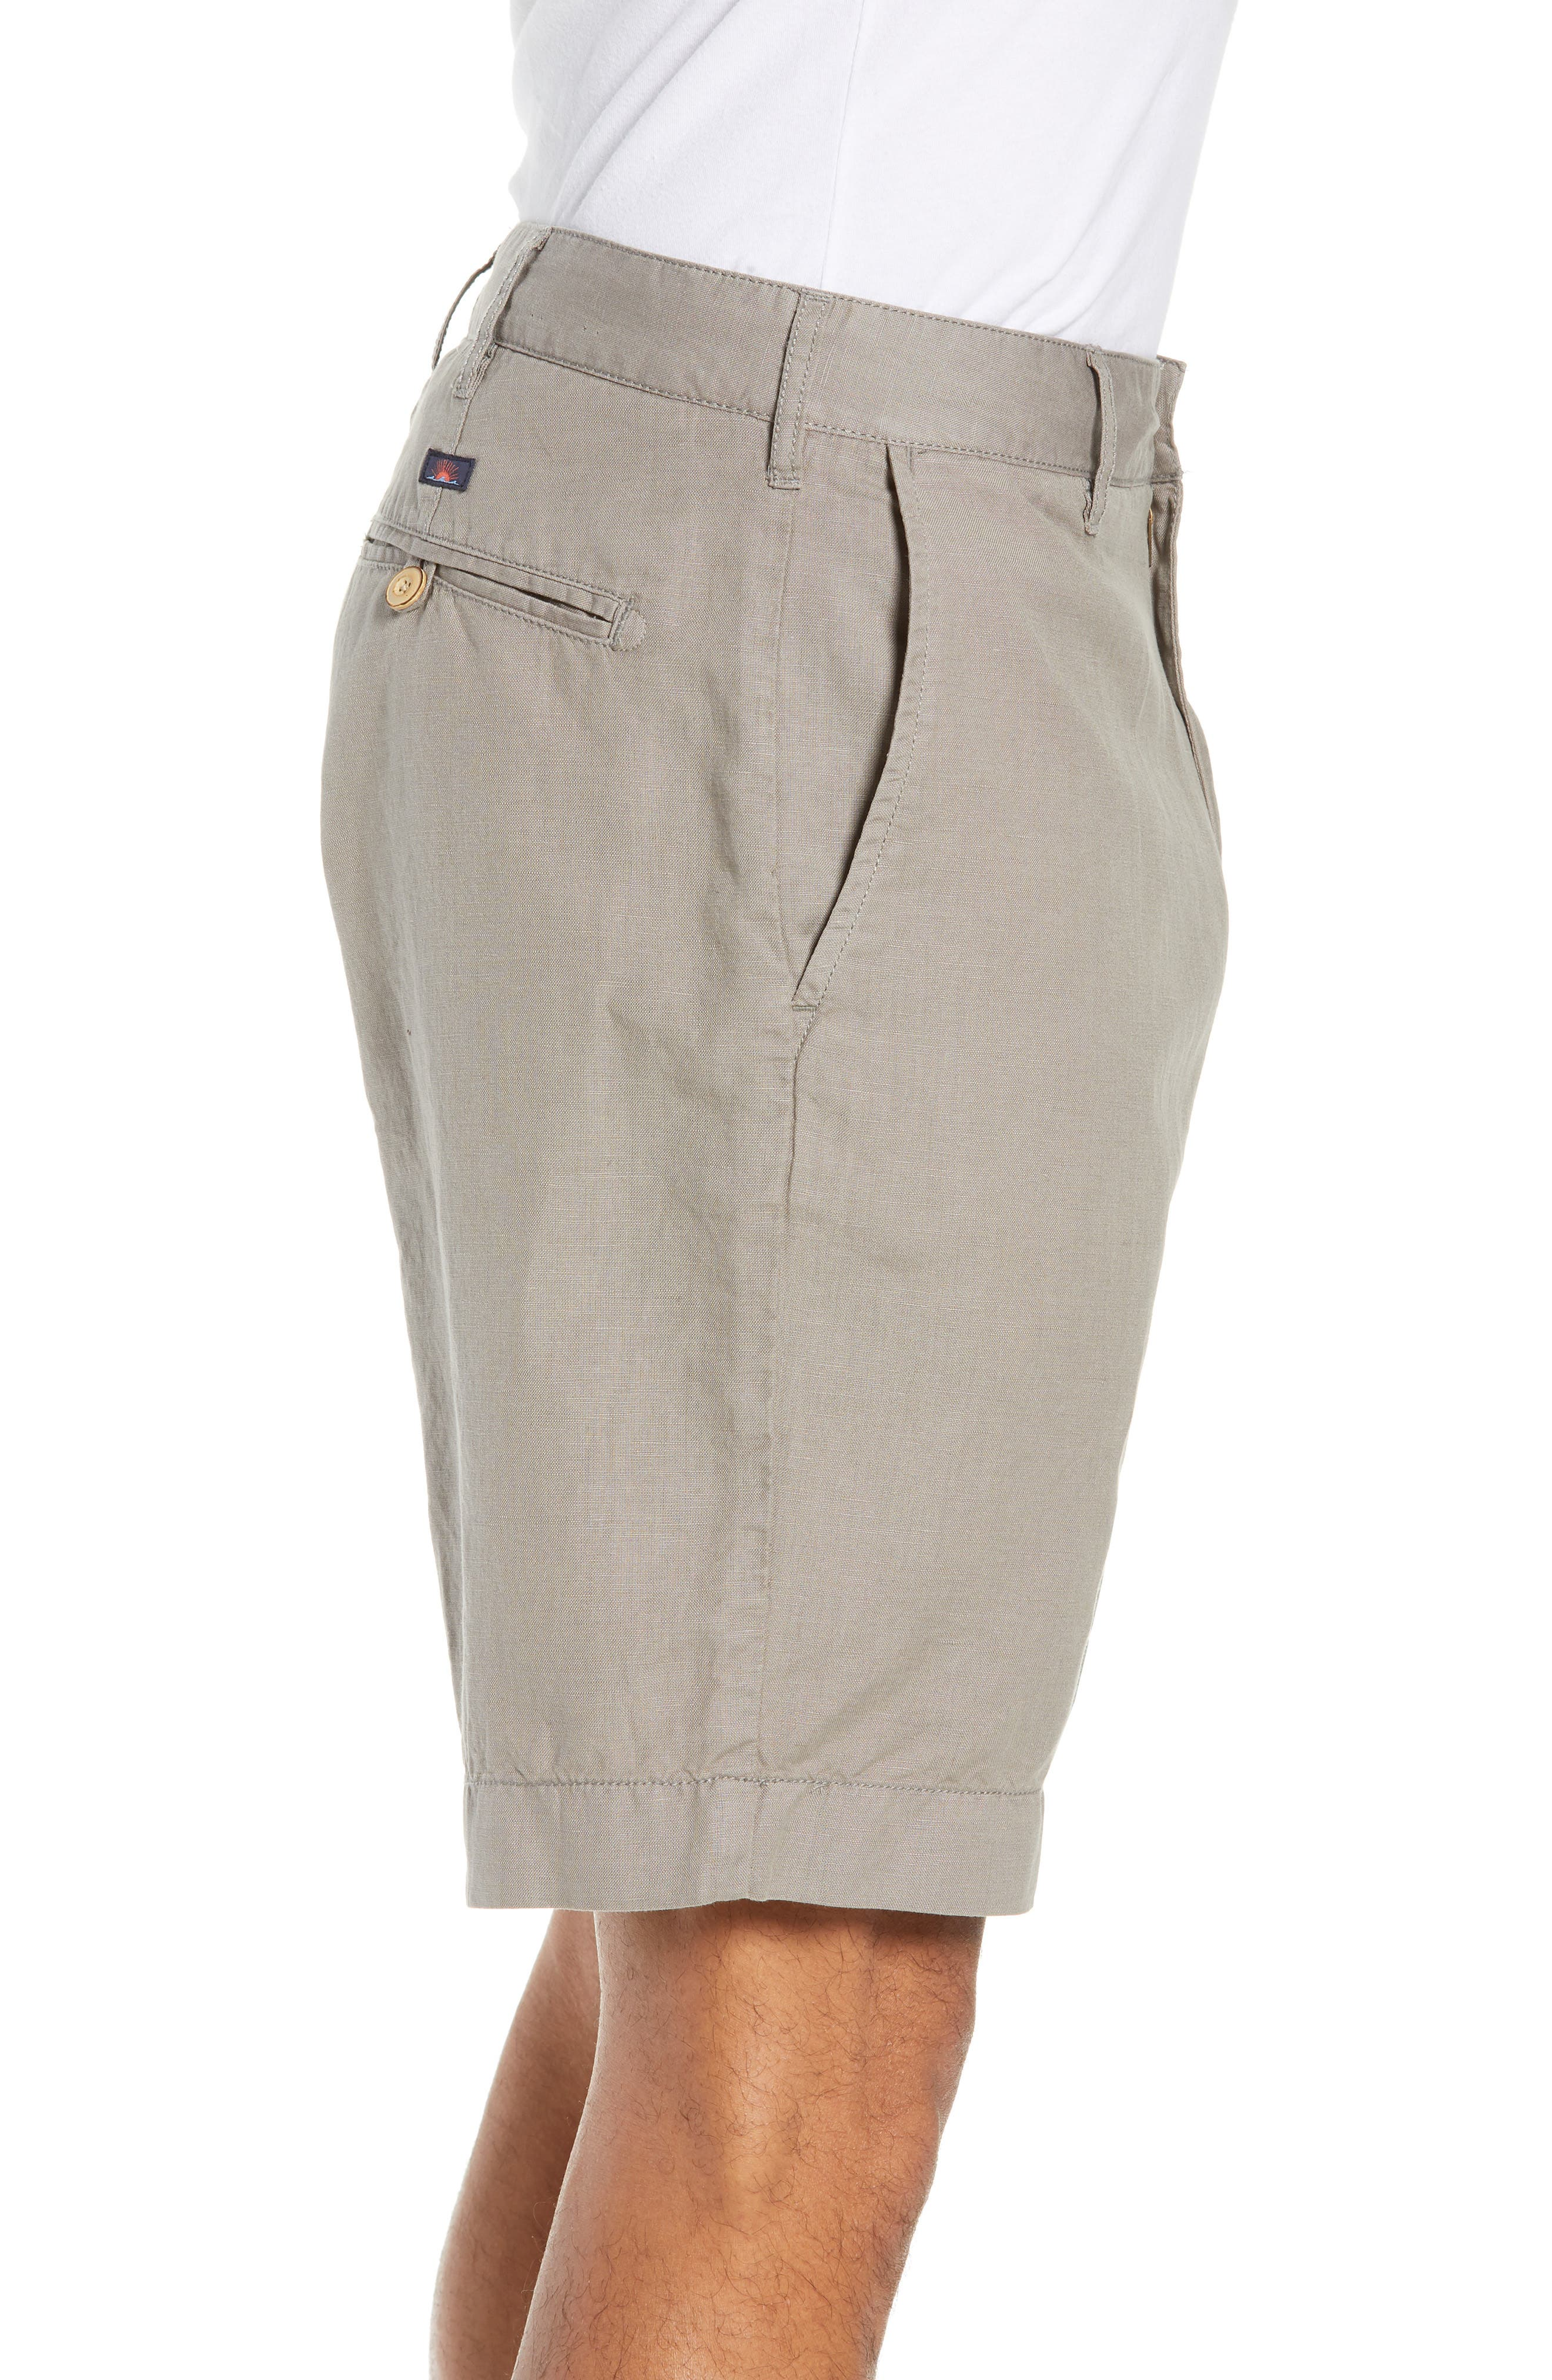 Malibu Shorts,                             Alternate thumbnail 3, color,                             GREY